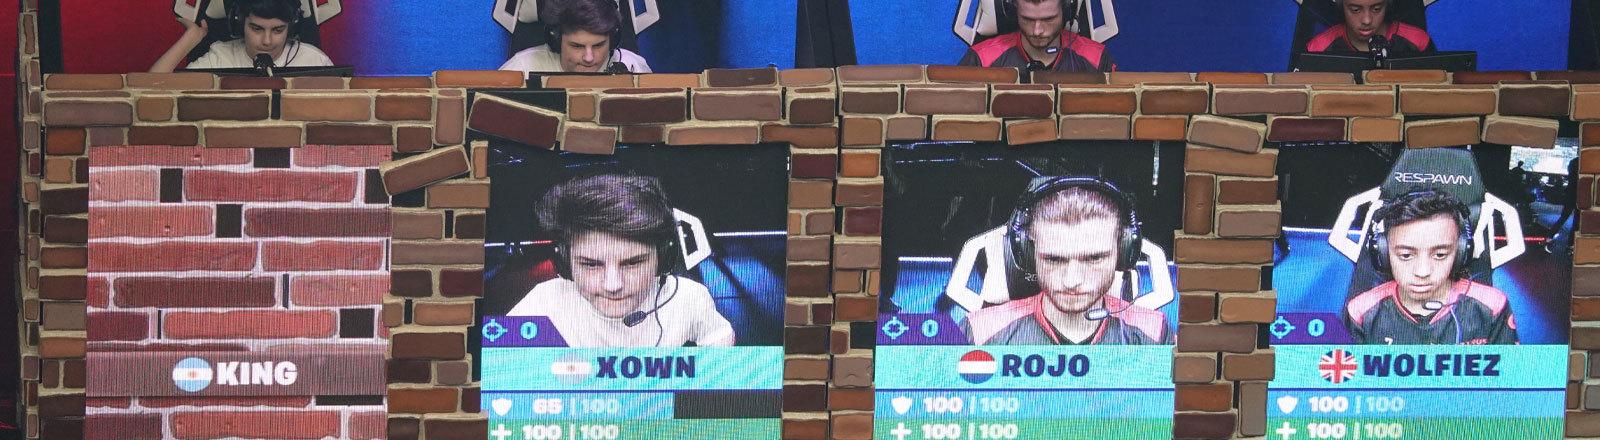 E-Sportler beim Fortnite World Cup in New York am 27.07.2019 hinter Bildschirmen